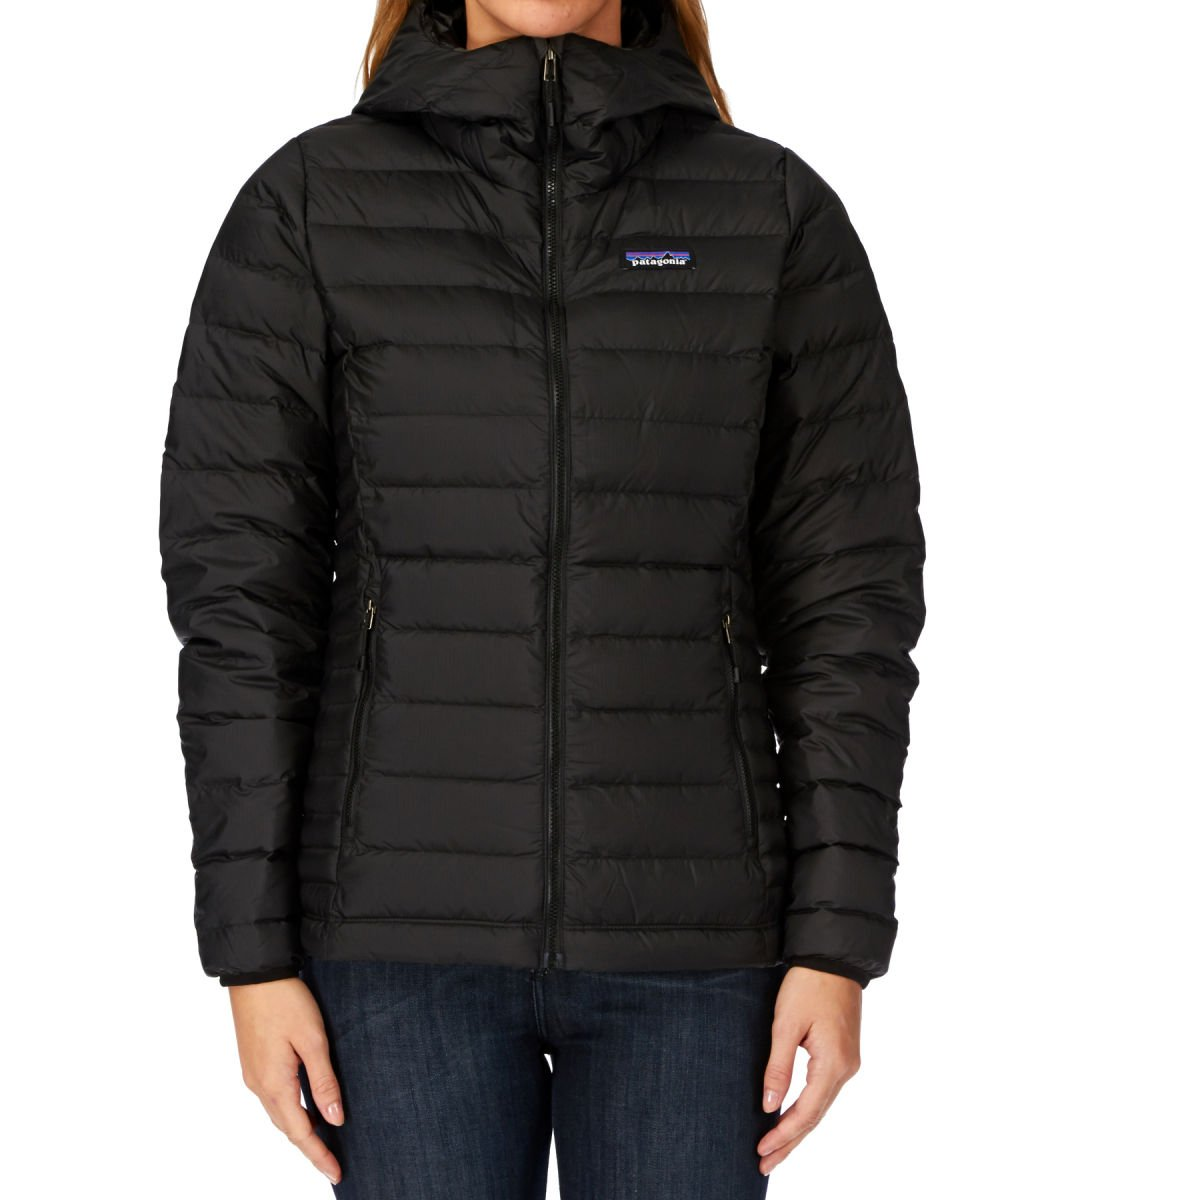 Patagonia Damen Jacke W'S Down Sweater Hoody